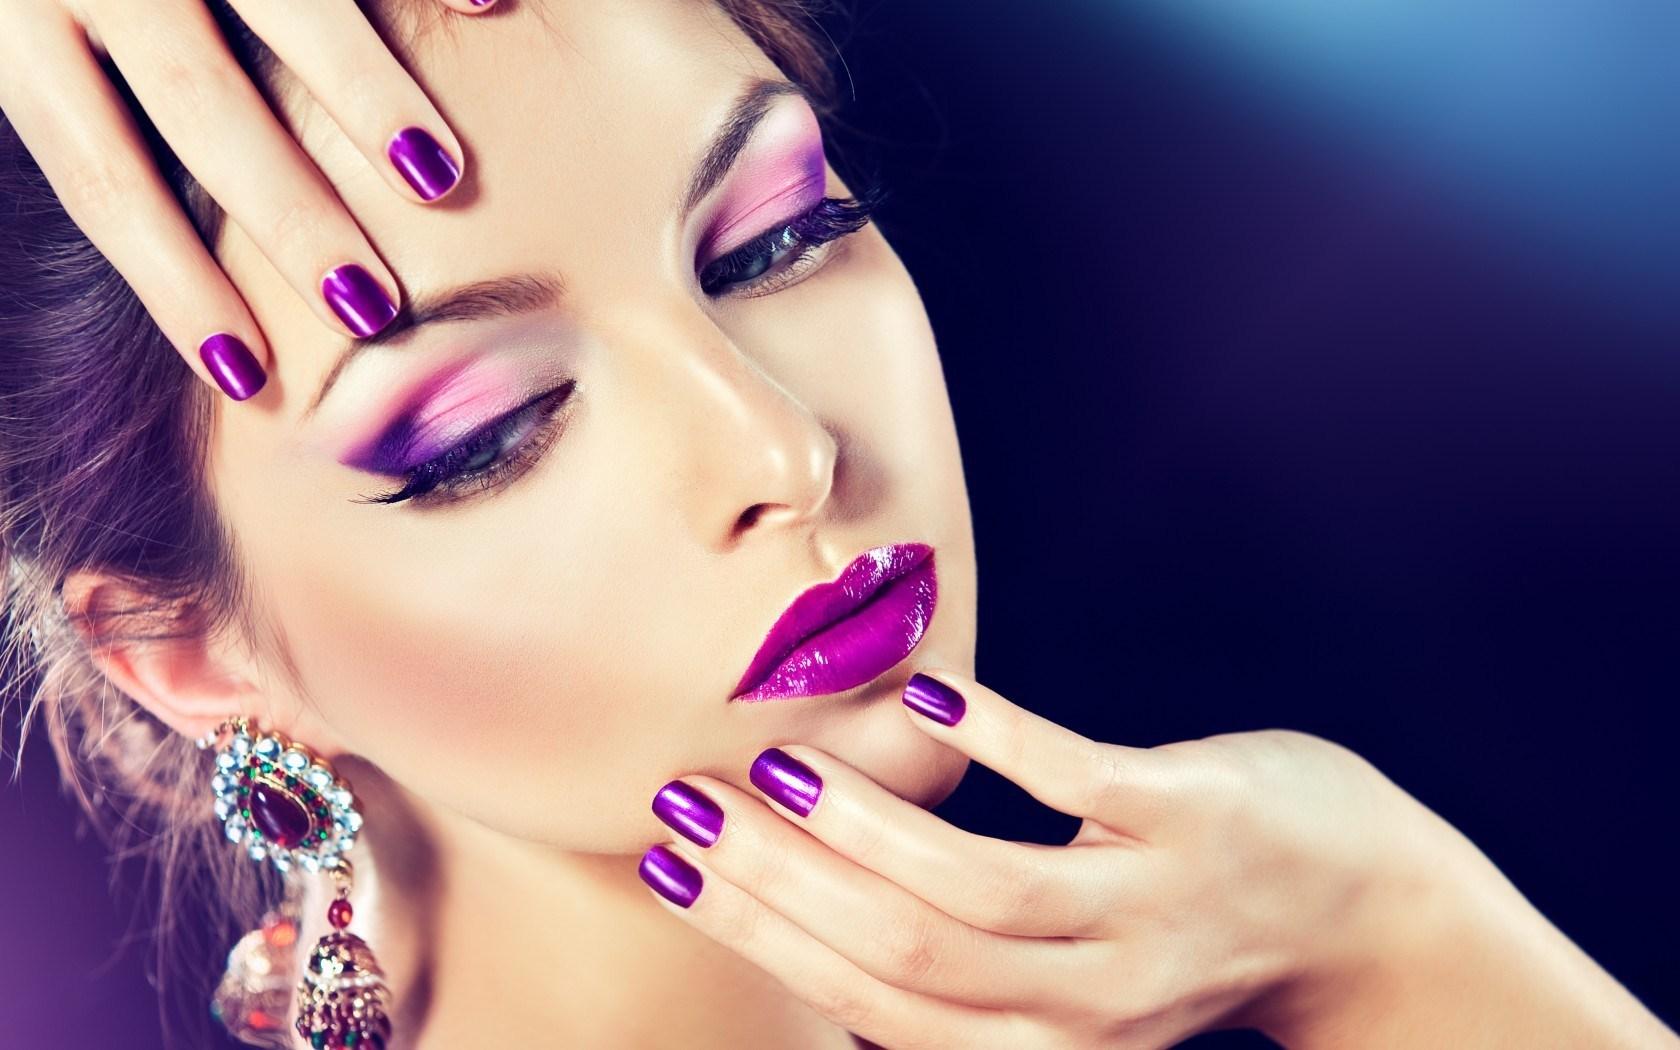 Хобби на стыке творчества и профессии: как найти курсы макияжа